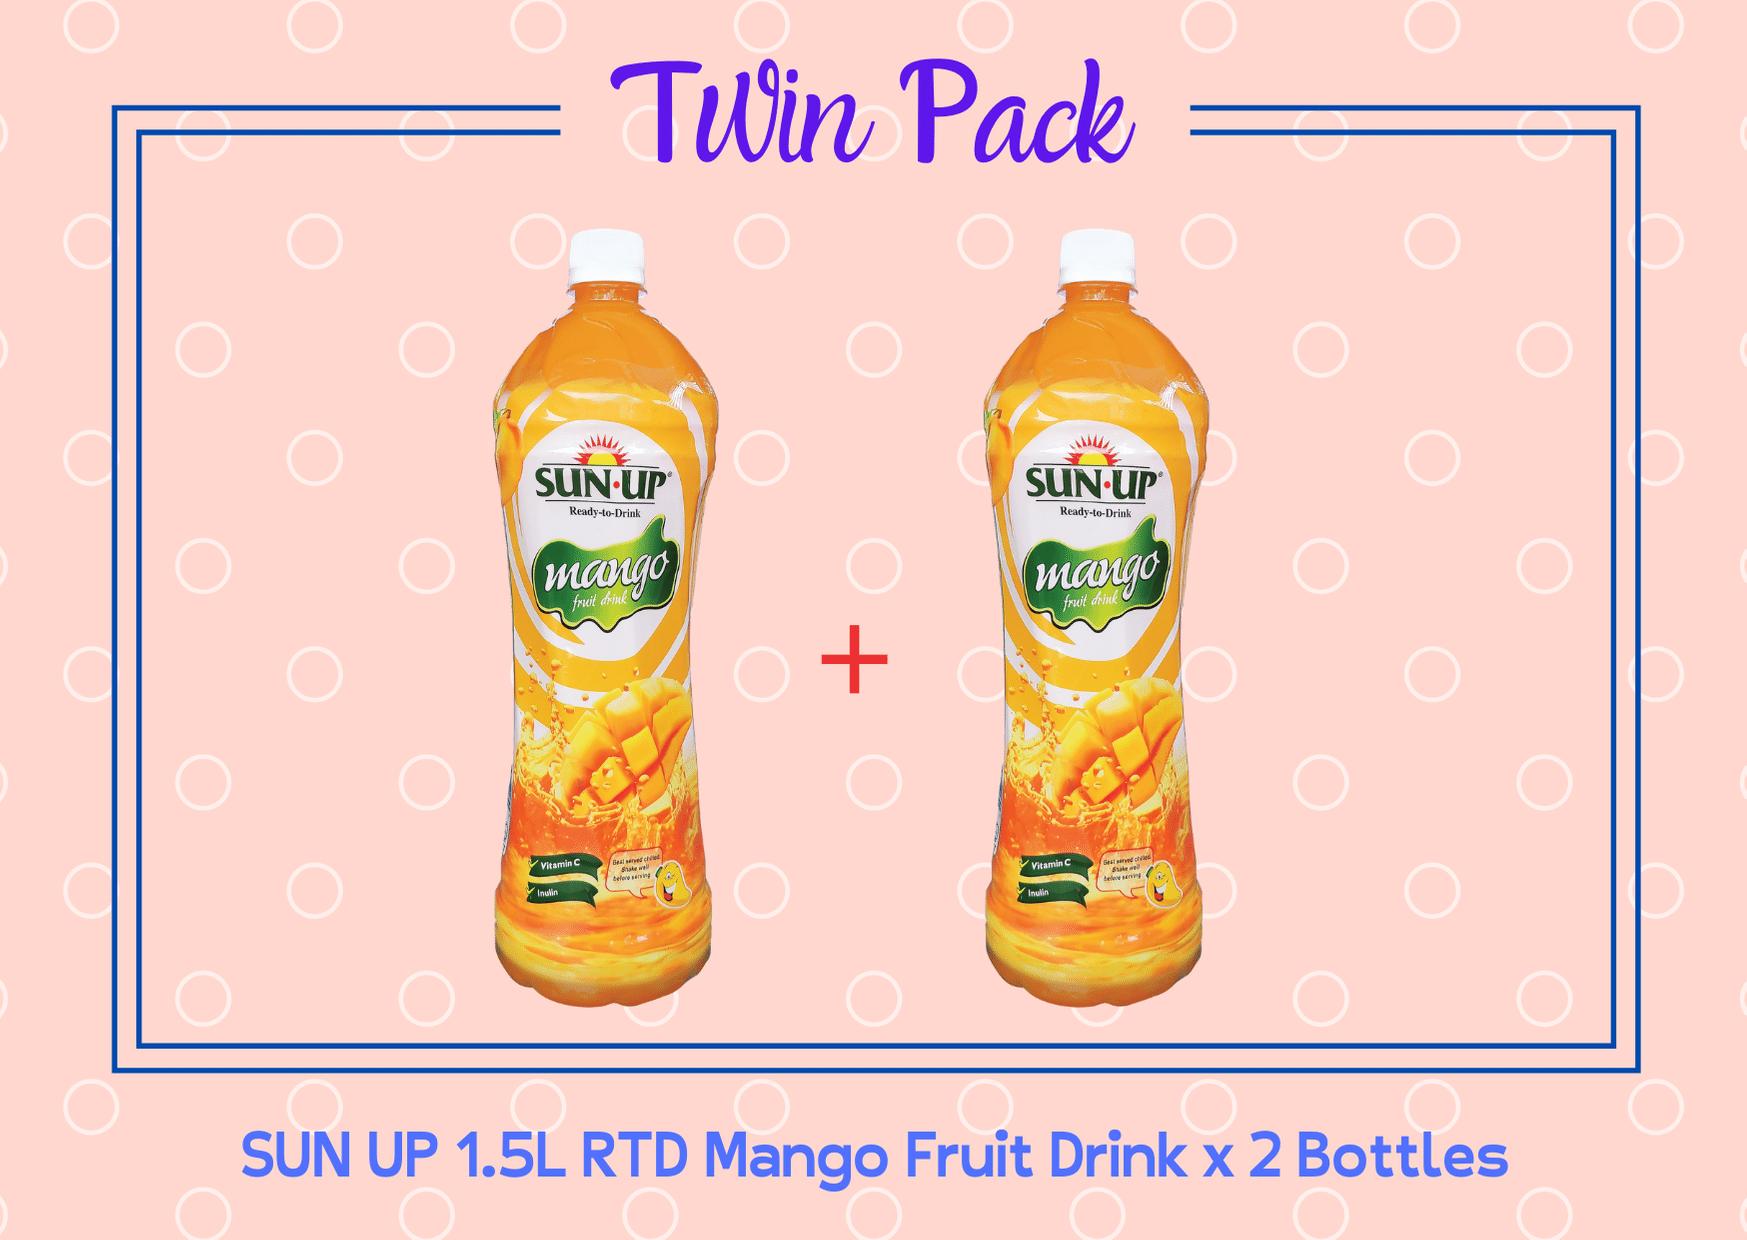 Promo Pack Sun Up 1.5L RTD Mango Fruit Drink